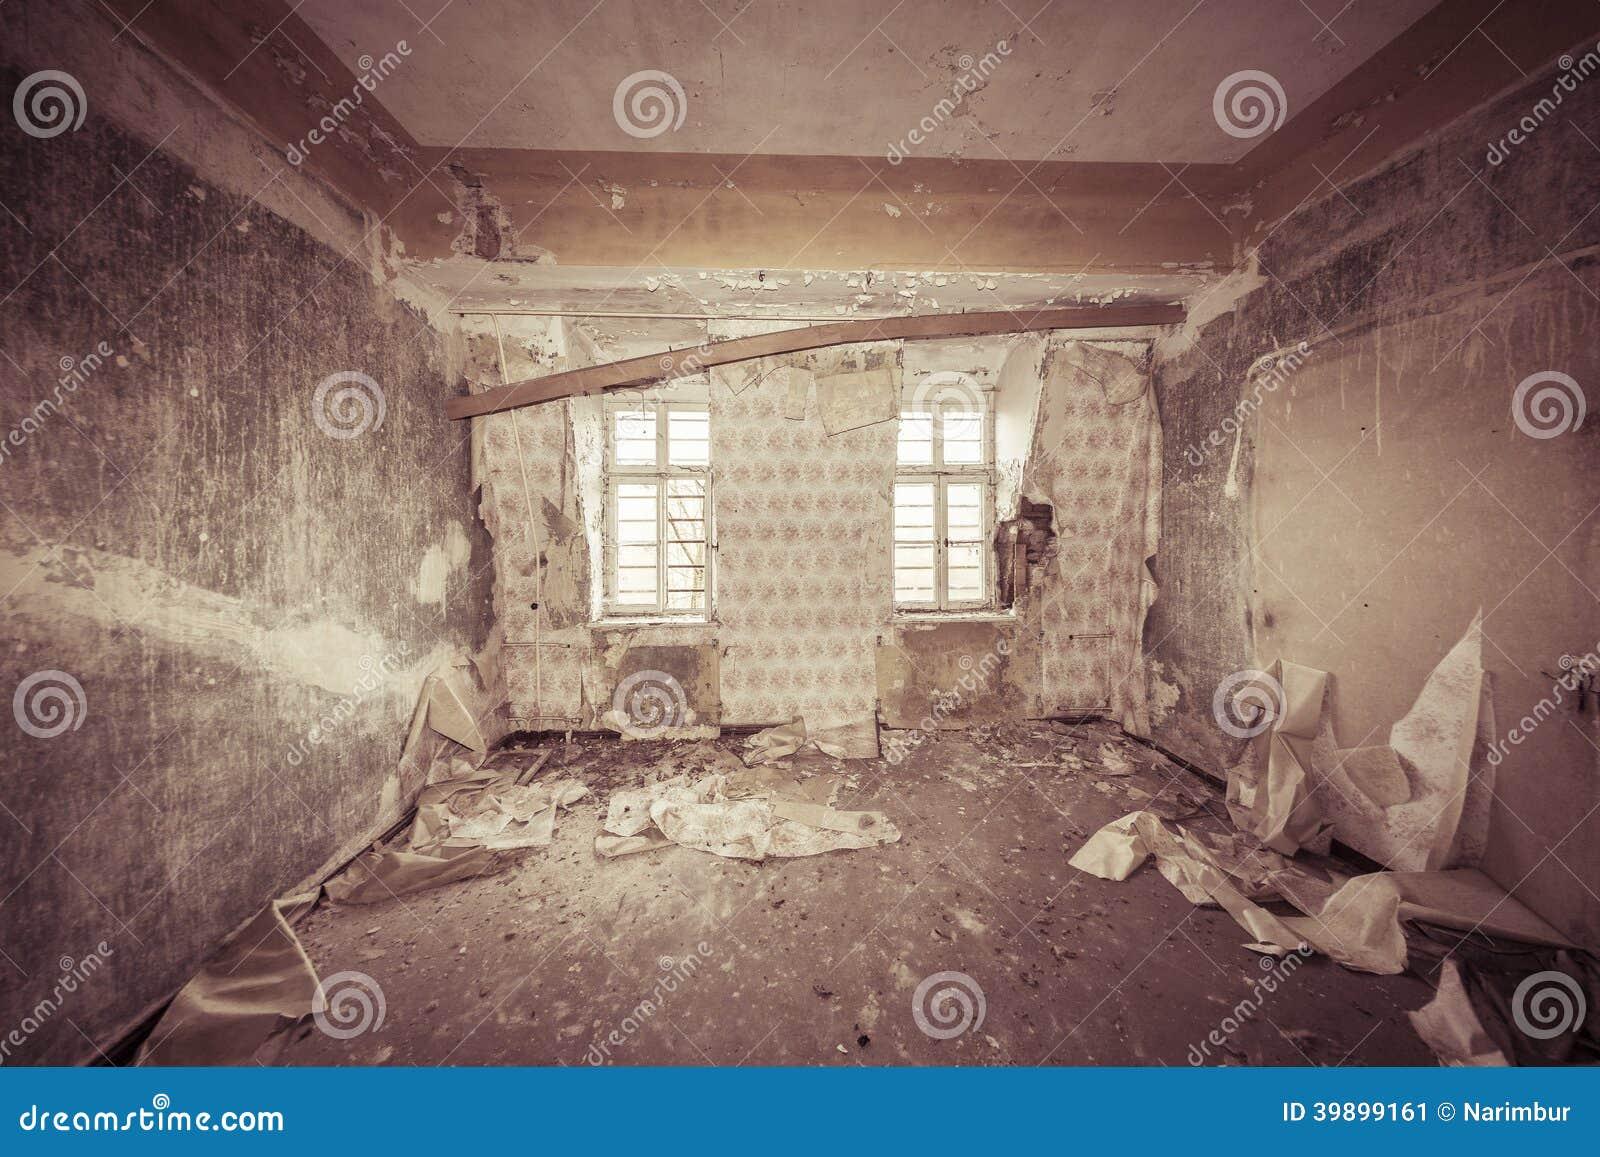 empty room wallpaper 1710x1226 - photo #46